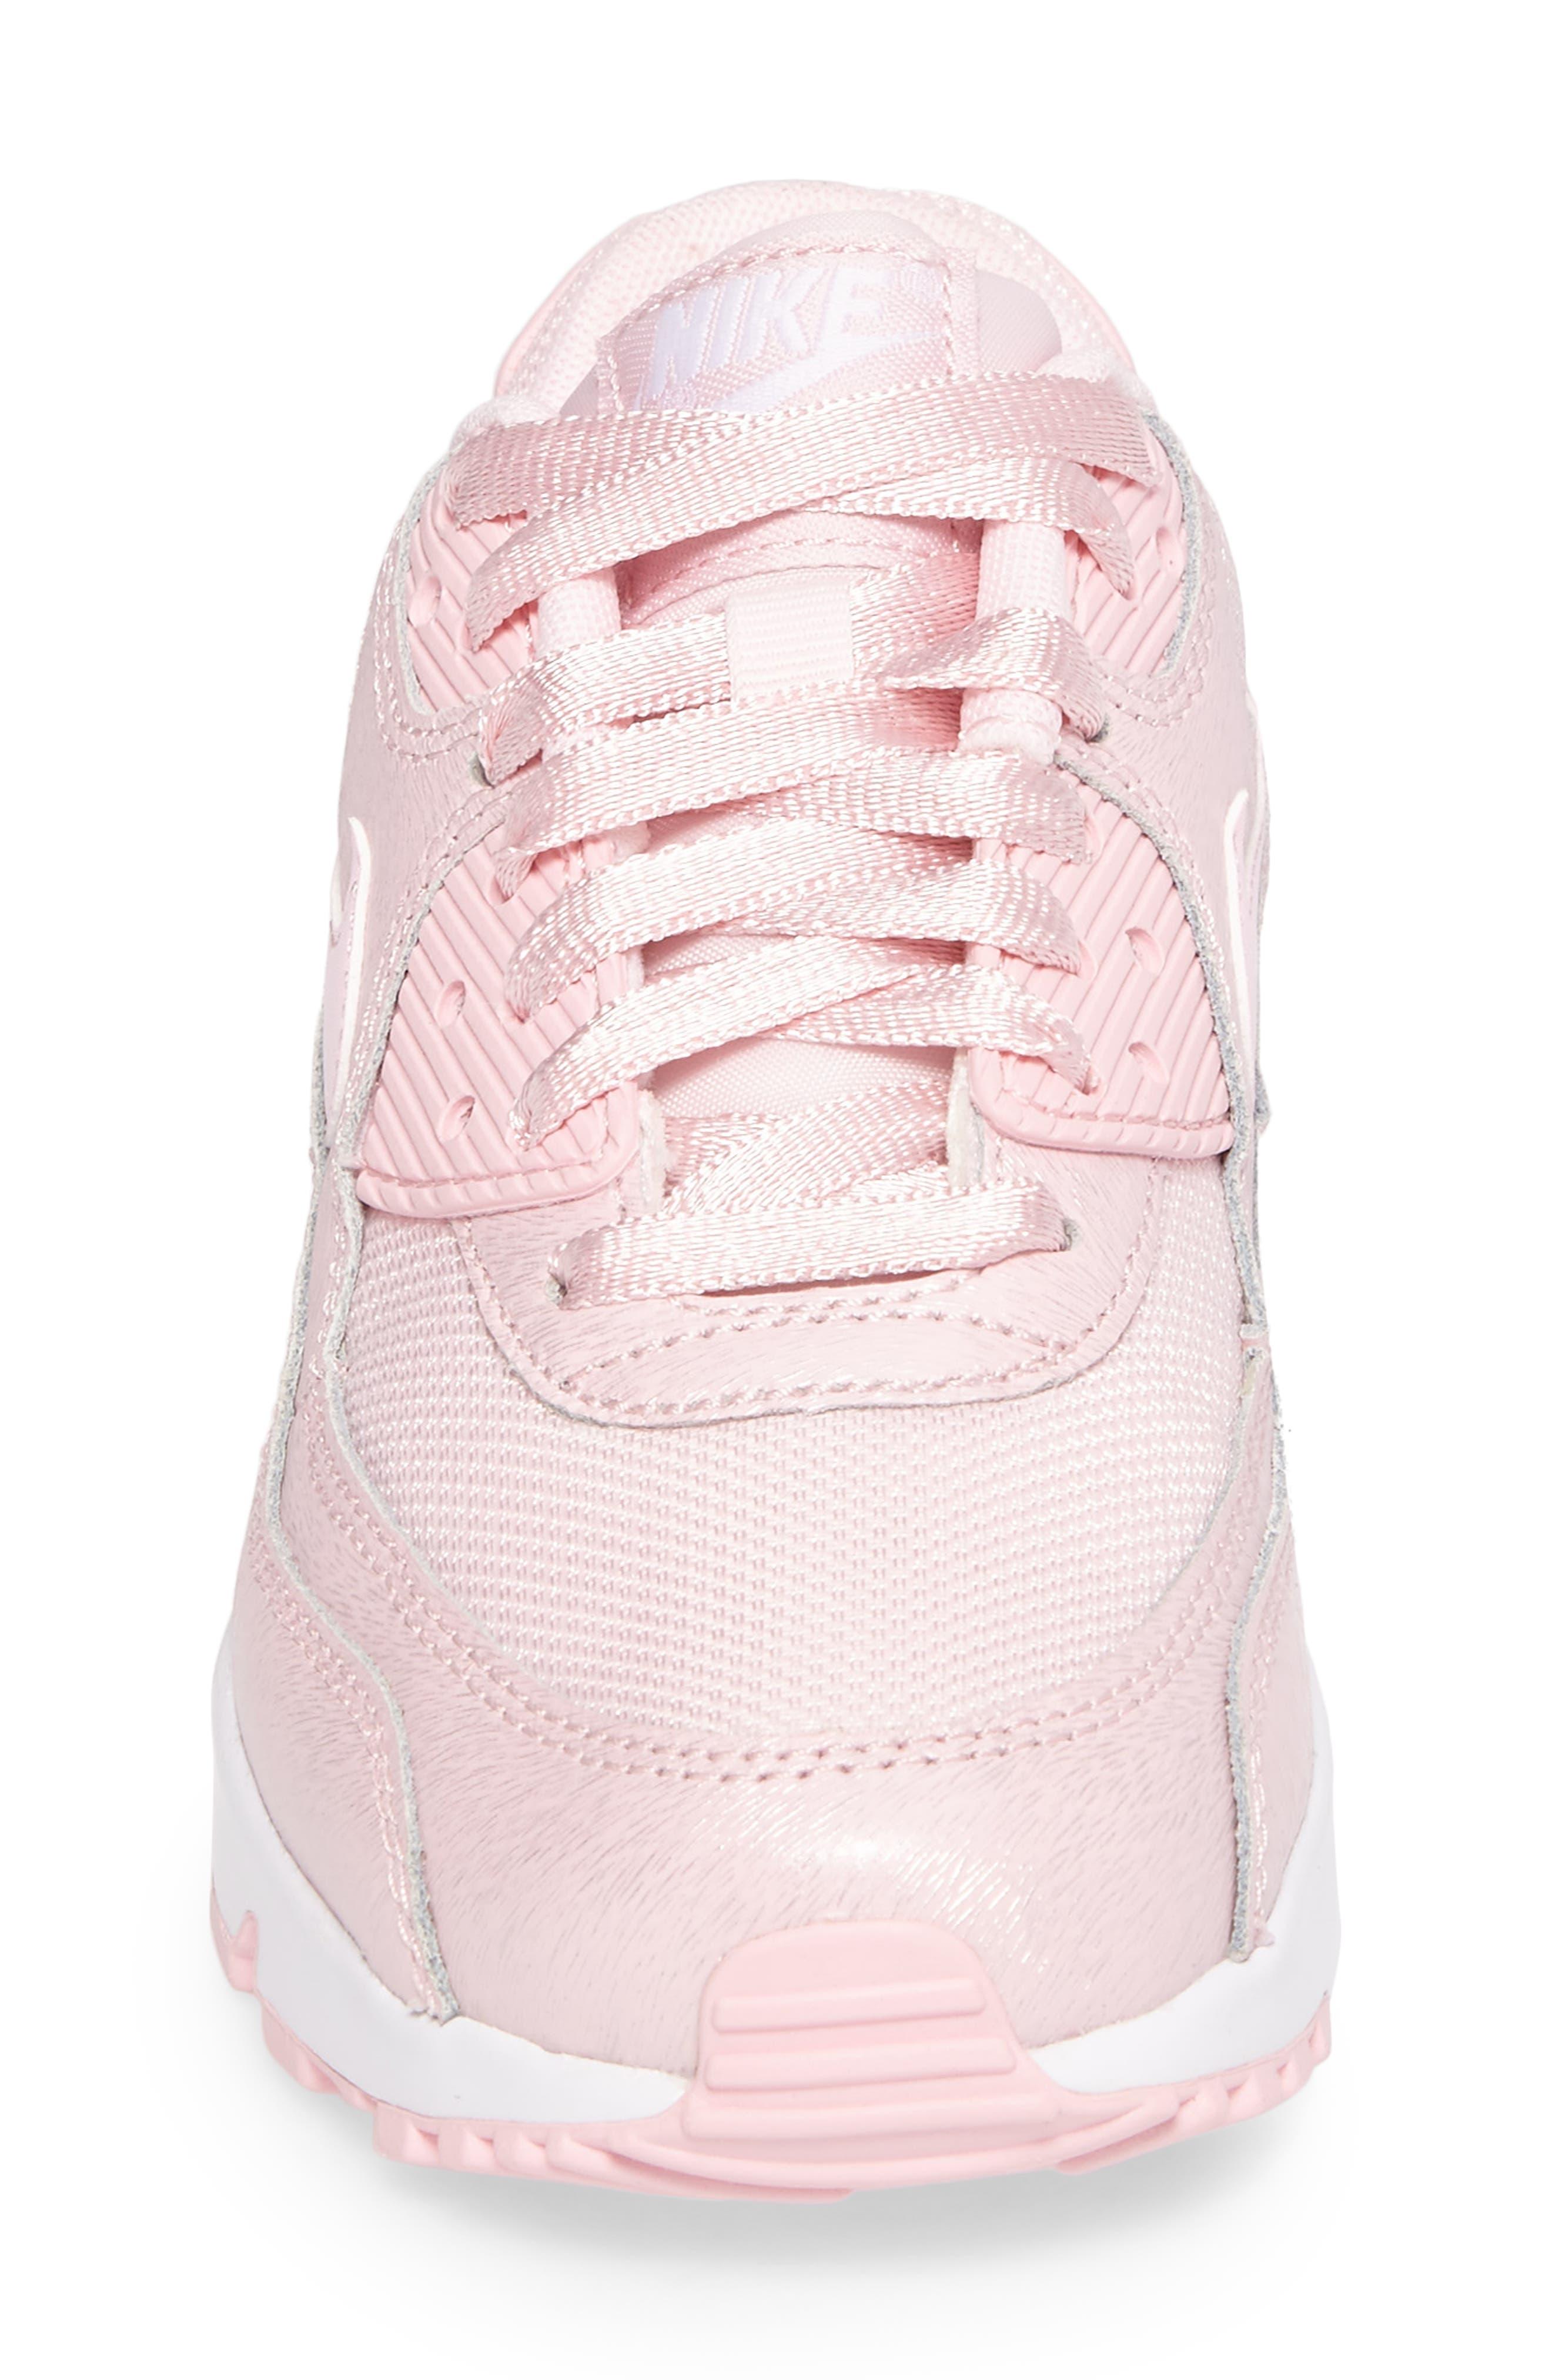 Air Max 90 Mesh Sneaker,                             Alternate thumbnail 3, color,                             Prism Pink/ White